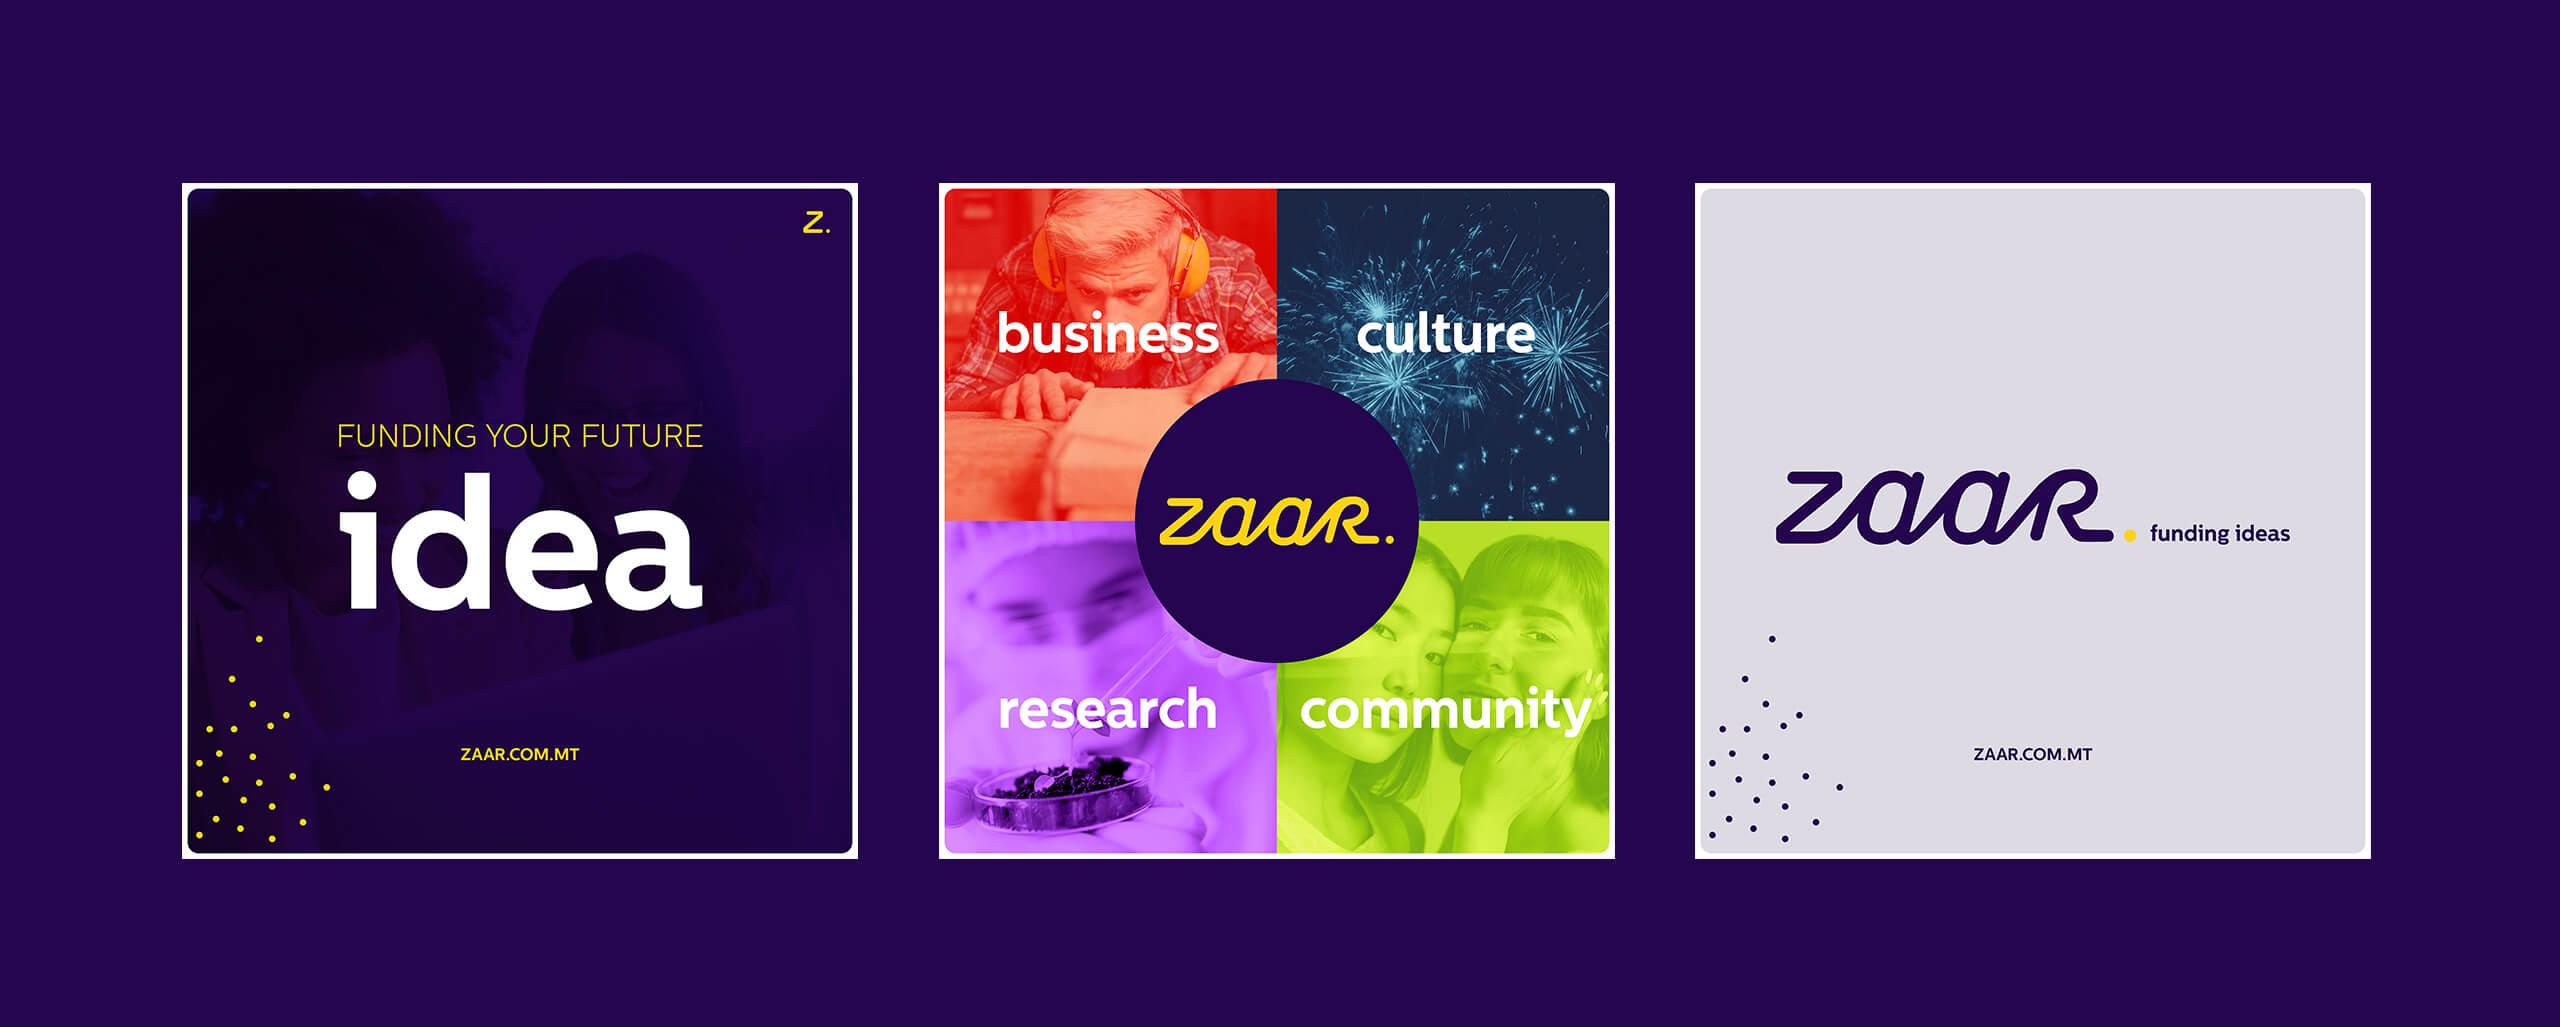 The-Concept-Stadium-Zaar-Behance-02_04 case study